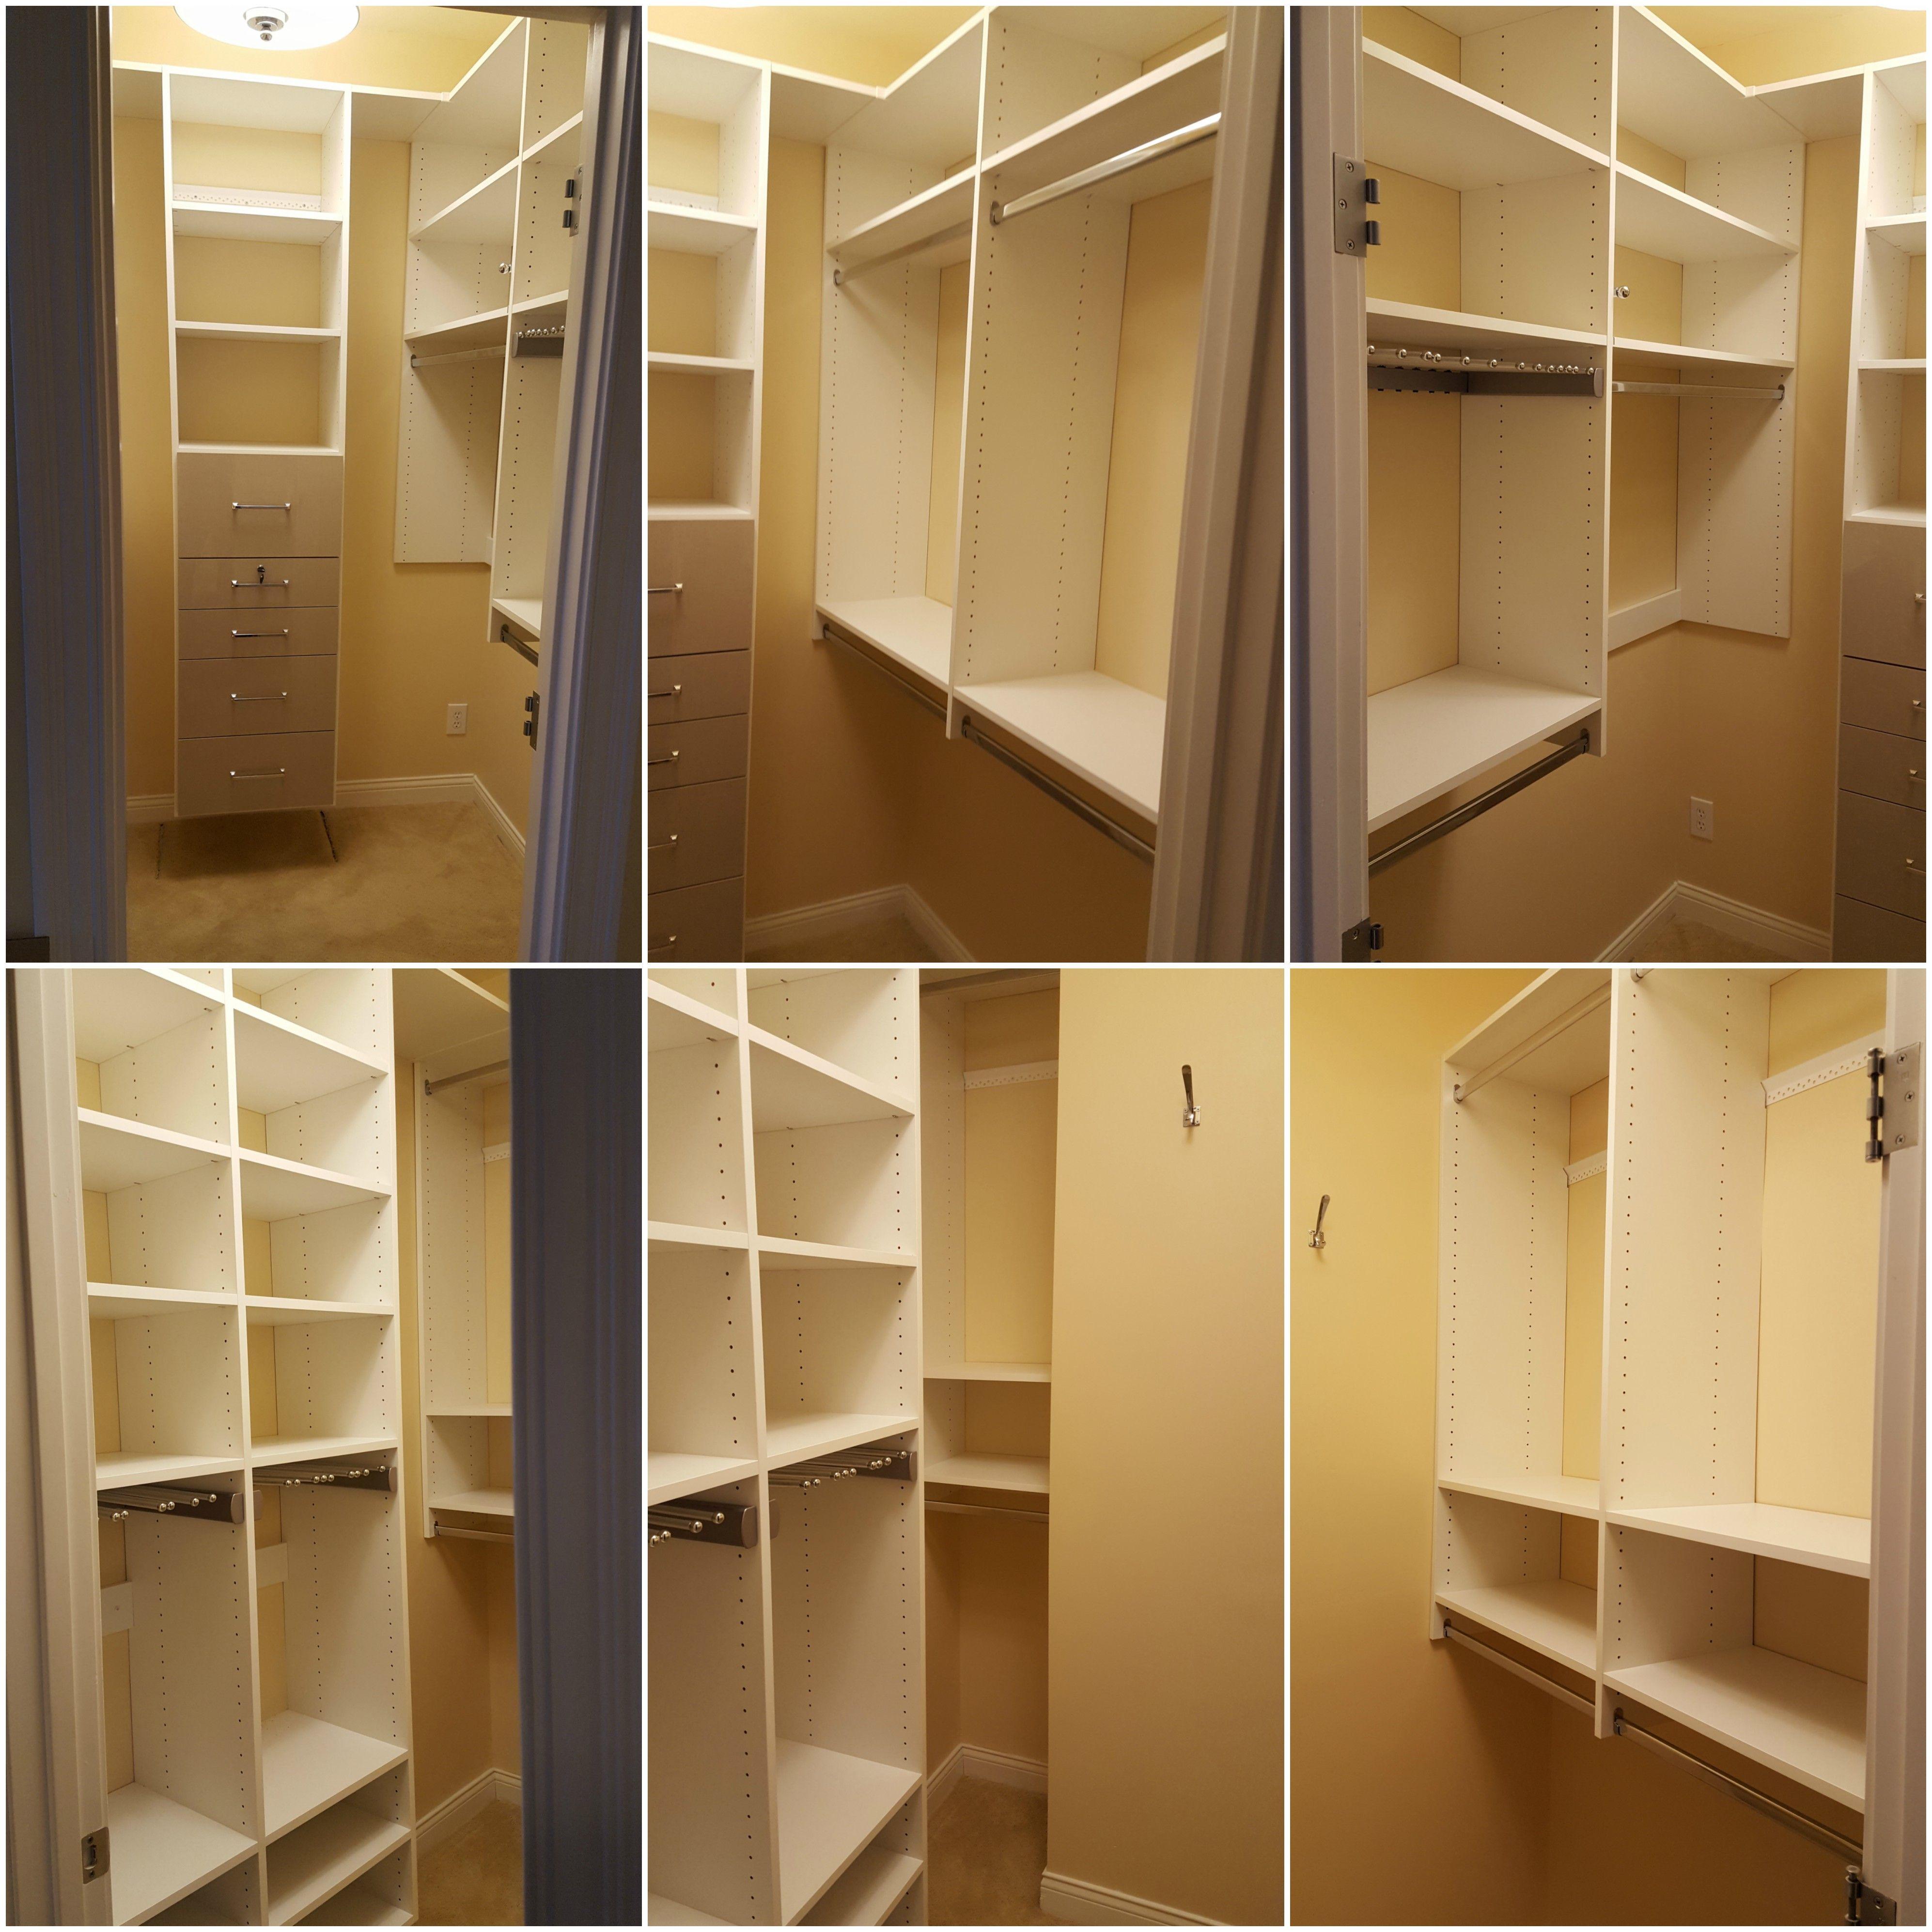 White Melamine Closet With Adjustable Shelving, Double Hang, Long Hang,  Hi Gloss Drawers, And Pull Out Pants Racks.